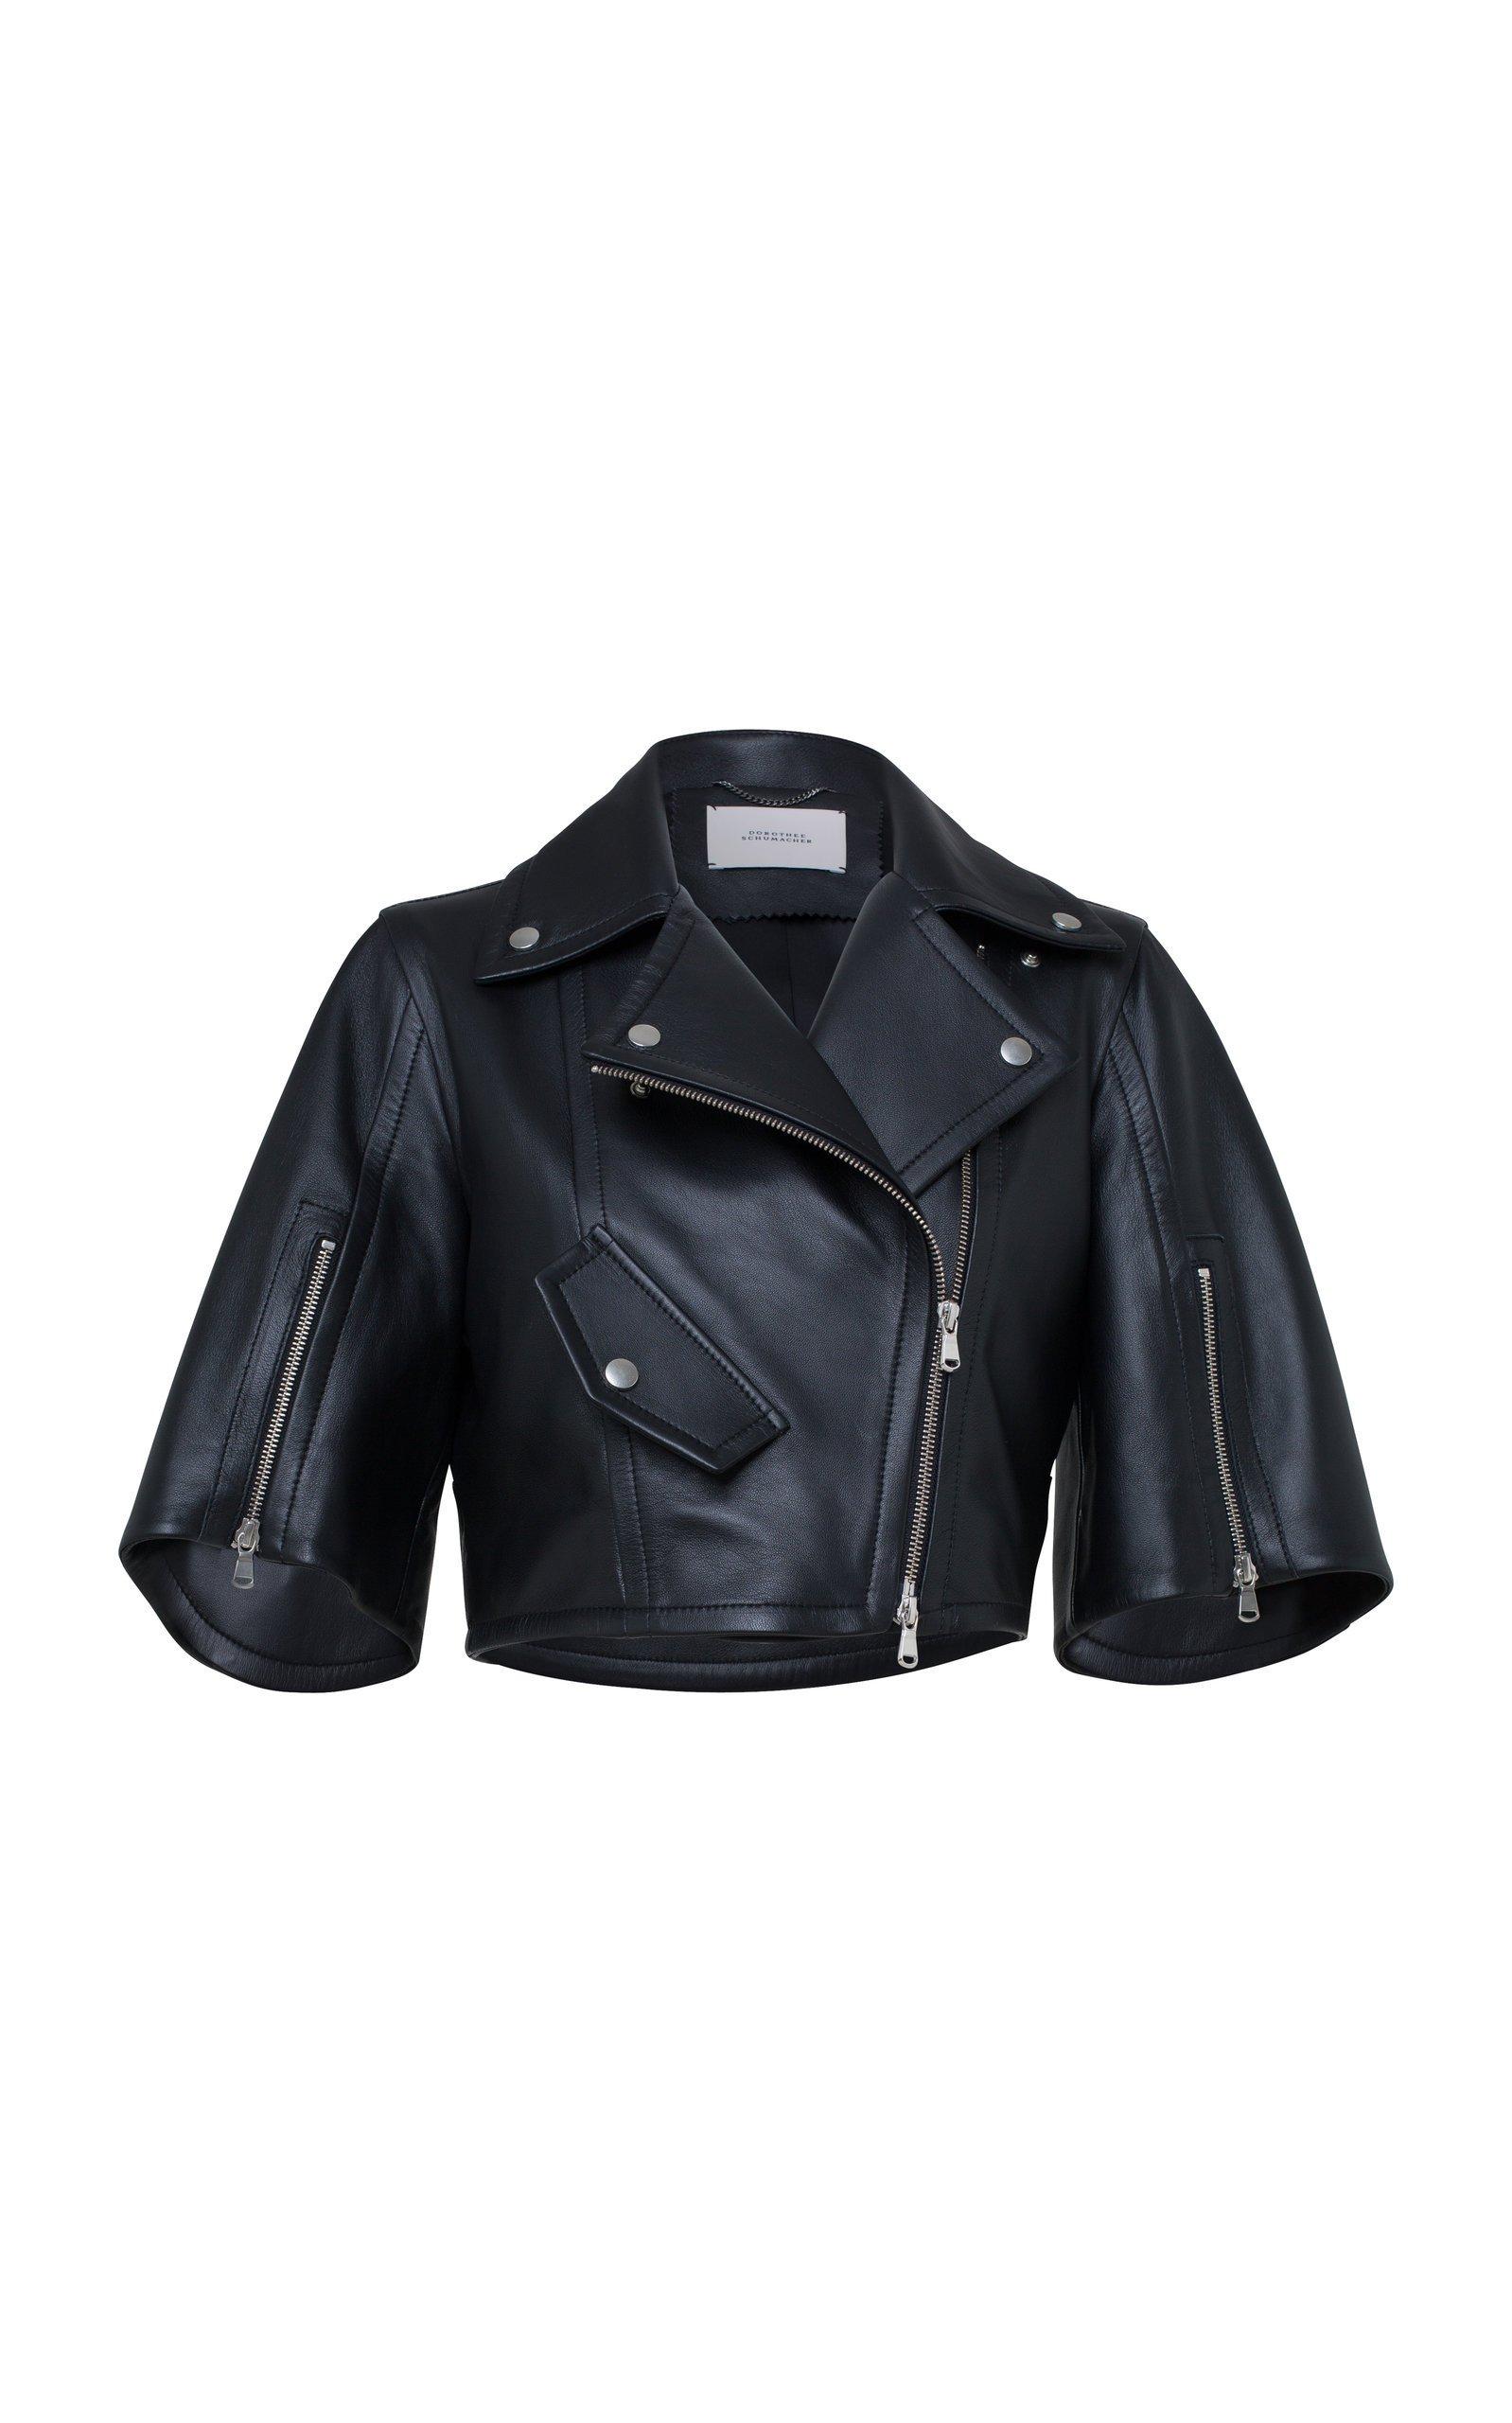 Dorothee Schumacher Modern Volumes Cropped Vegan Leather Jacket